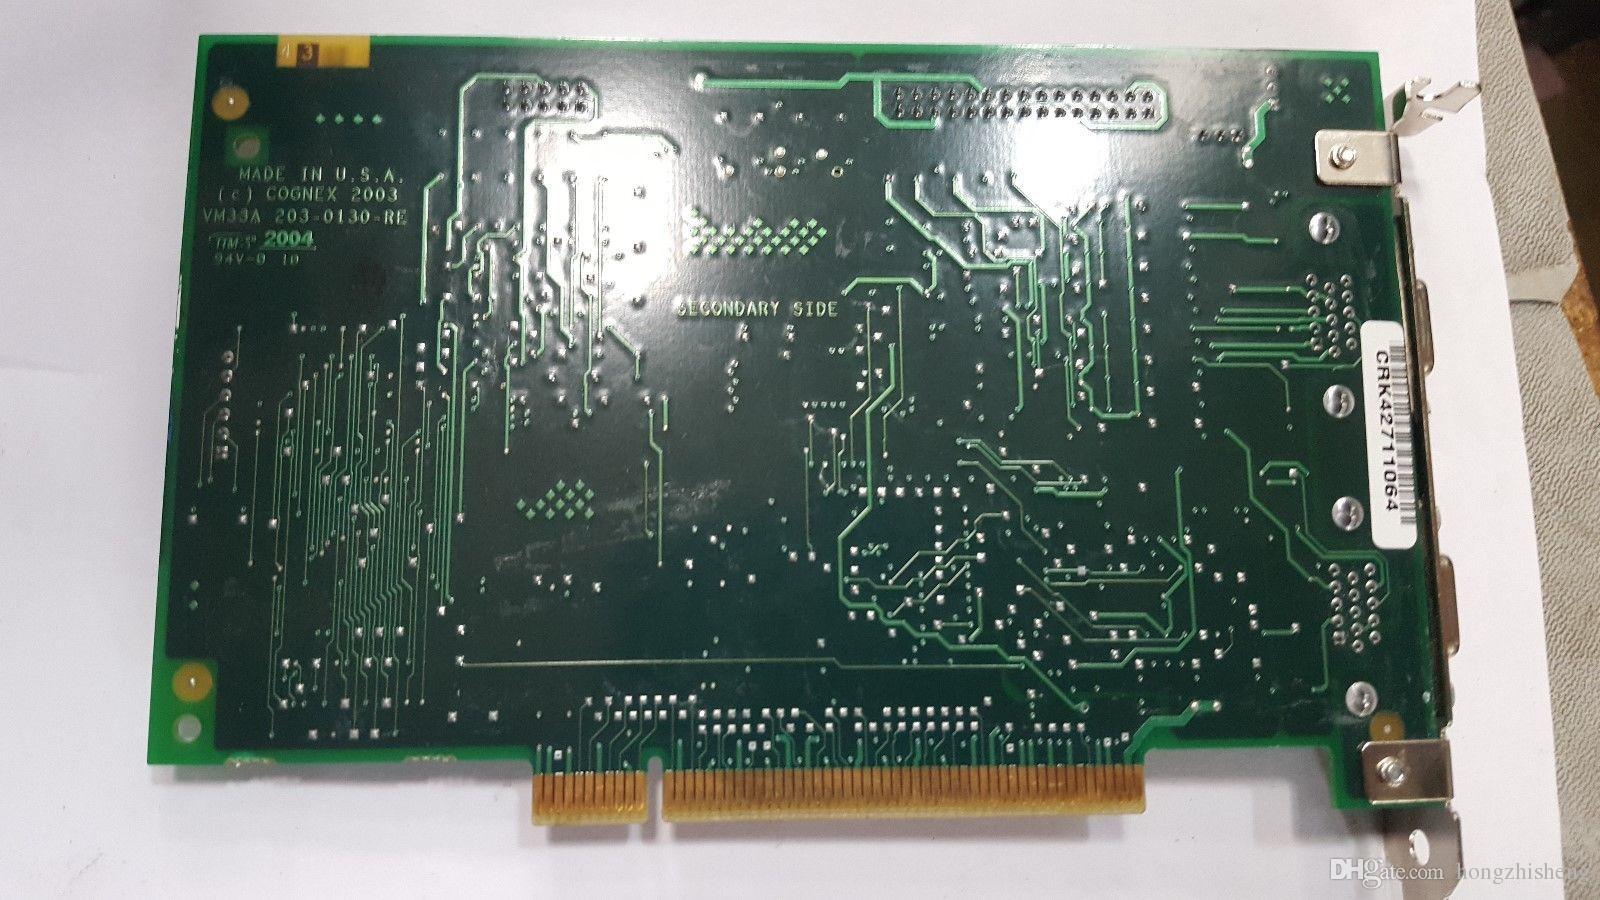 Плата Cognex Vision VPM-8100LVQ-000-P REV A R6S2.7B3